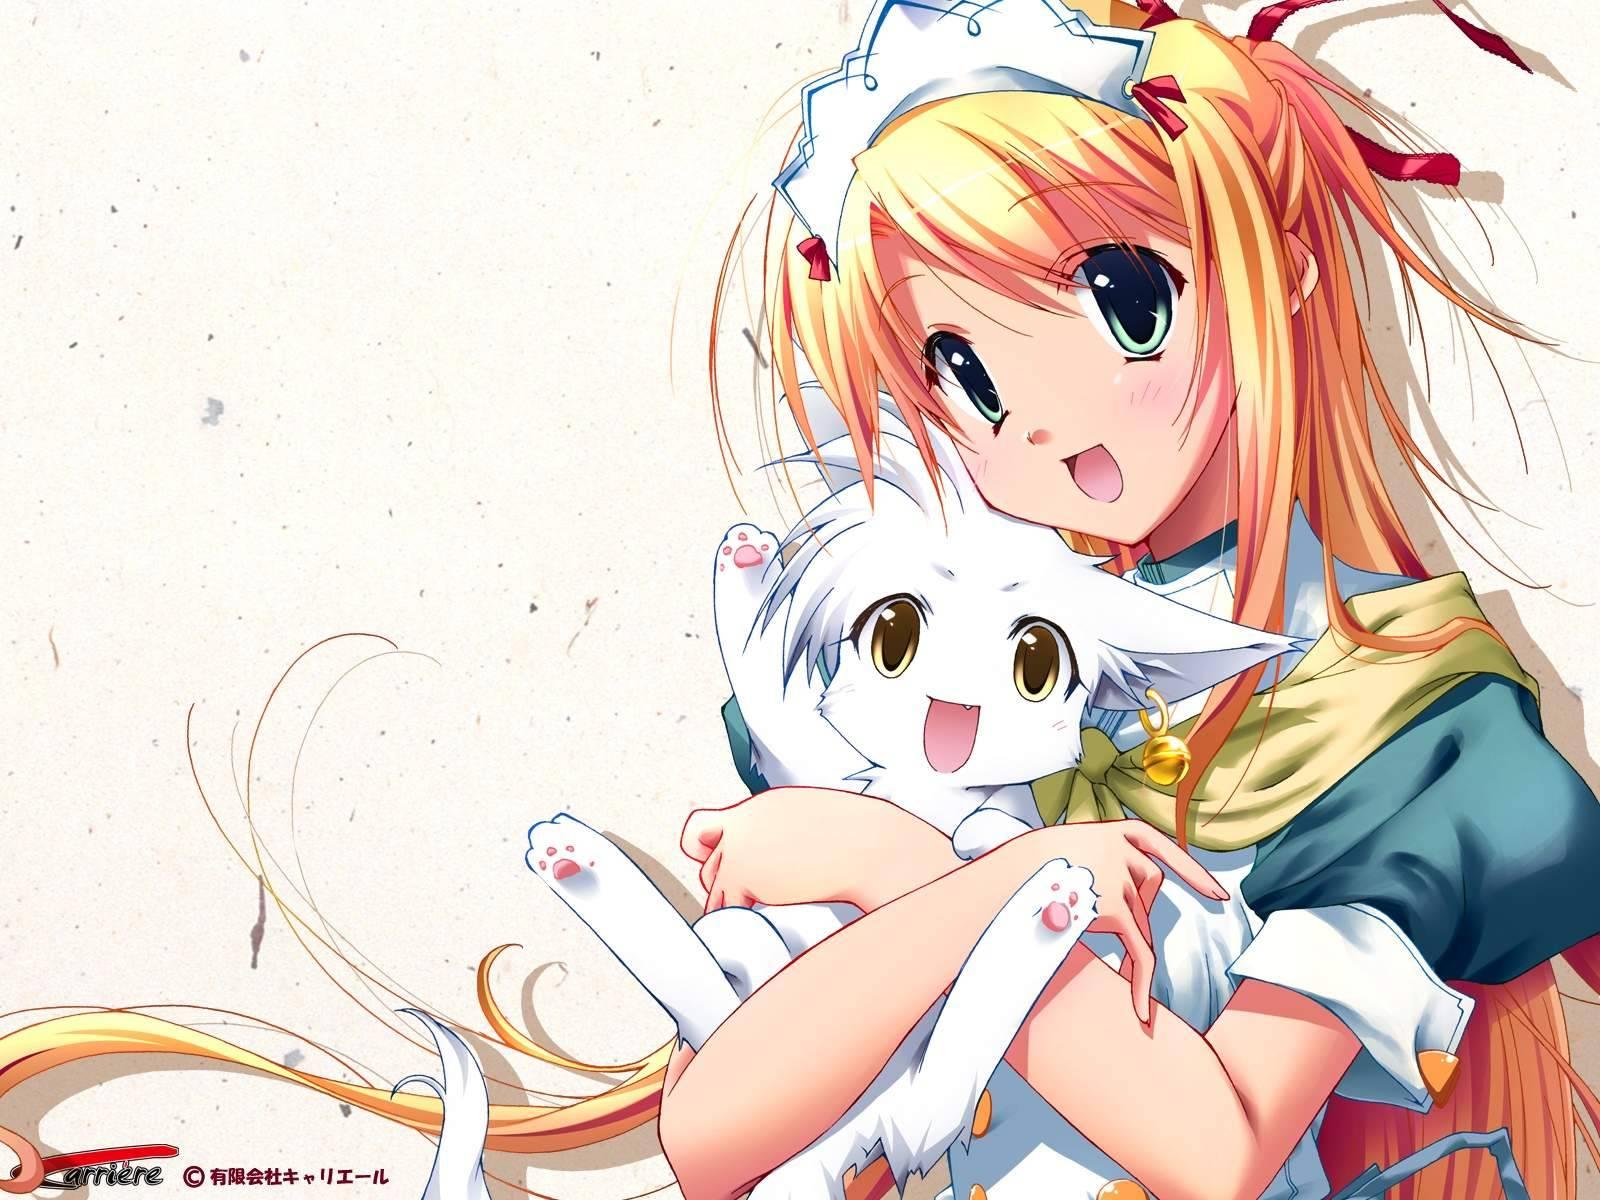 Wallpaper   Anime Manga Wallpaper 1600x1200